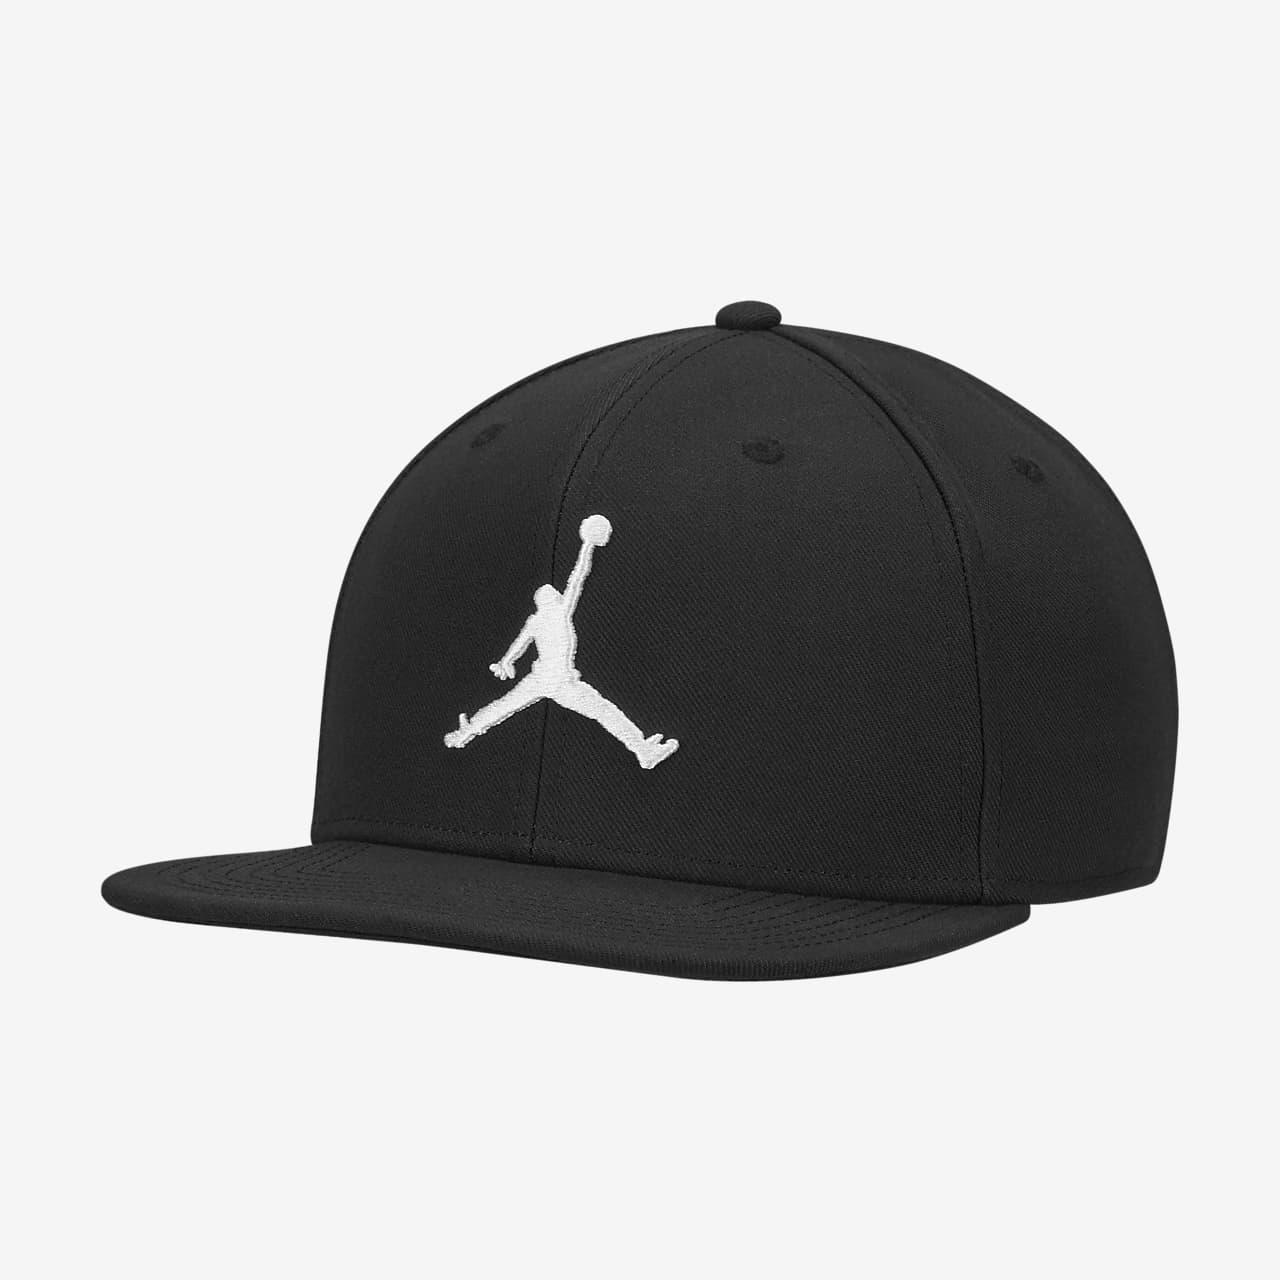 Jordan Pro Jumpman Snapback sapka